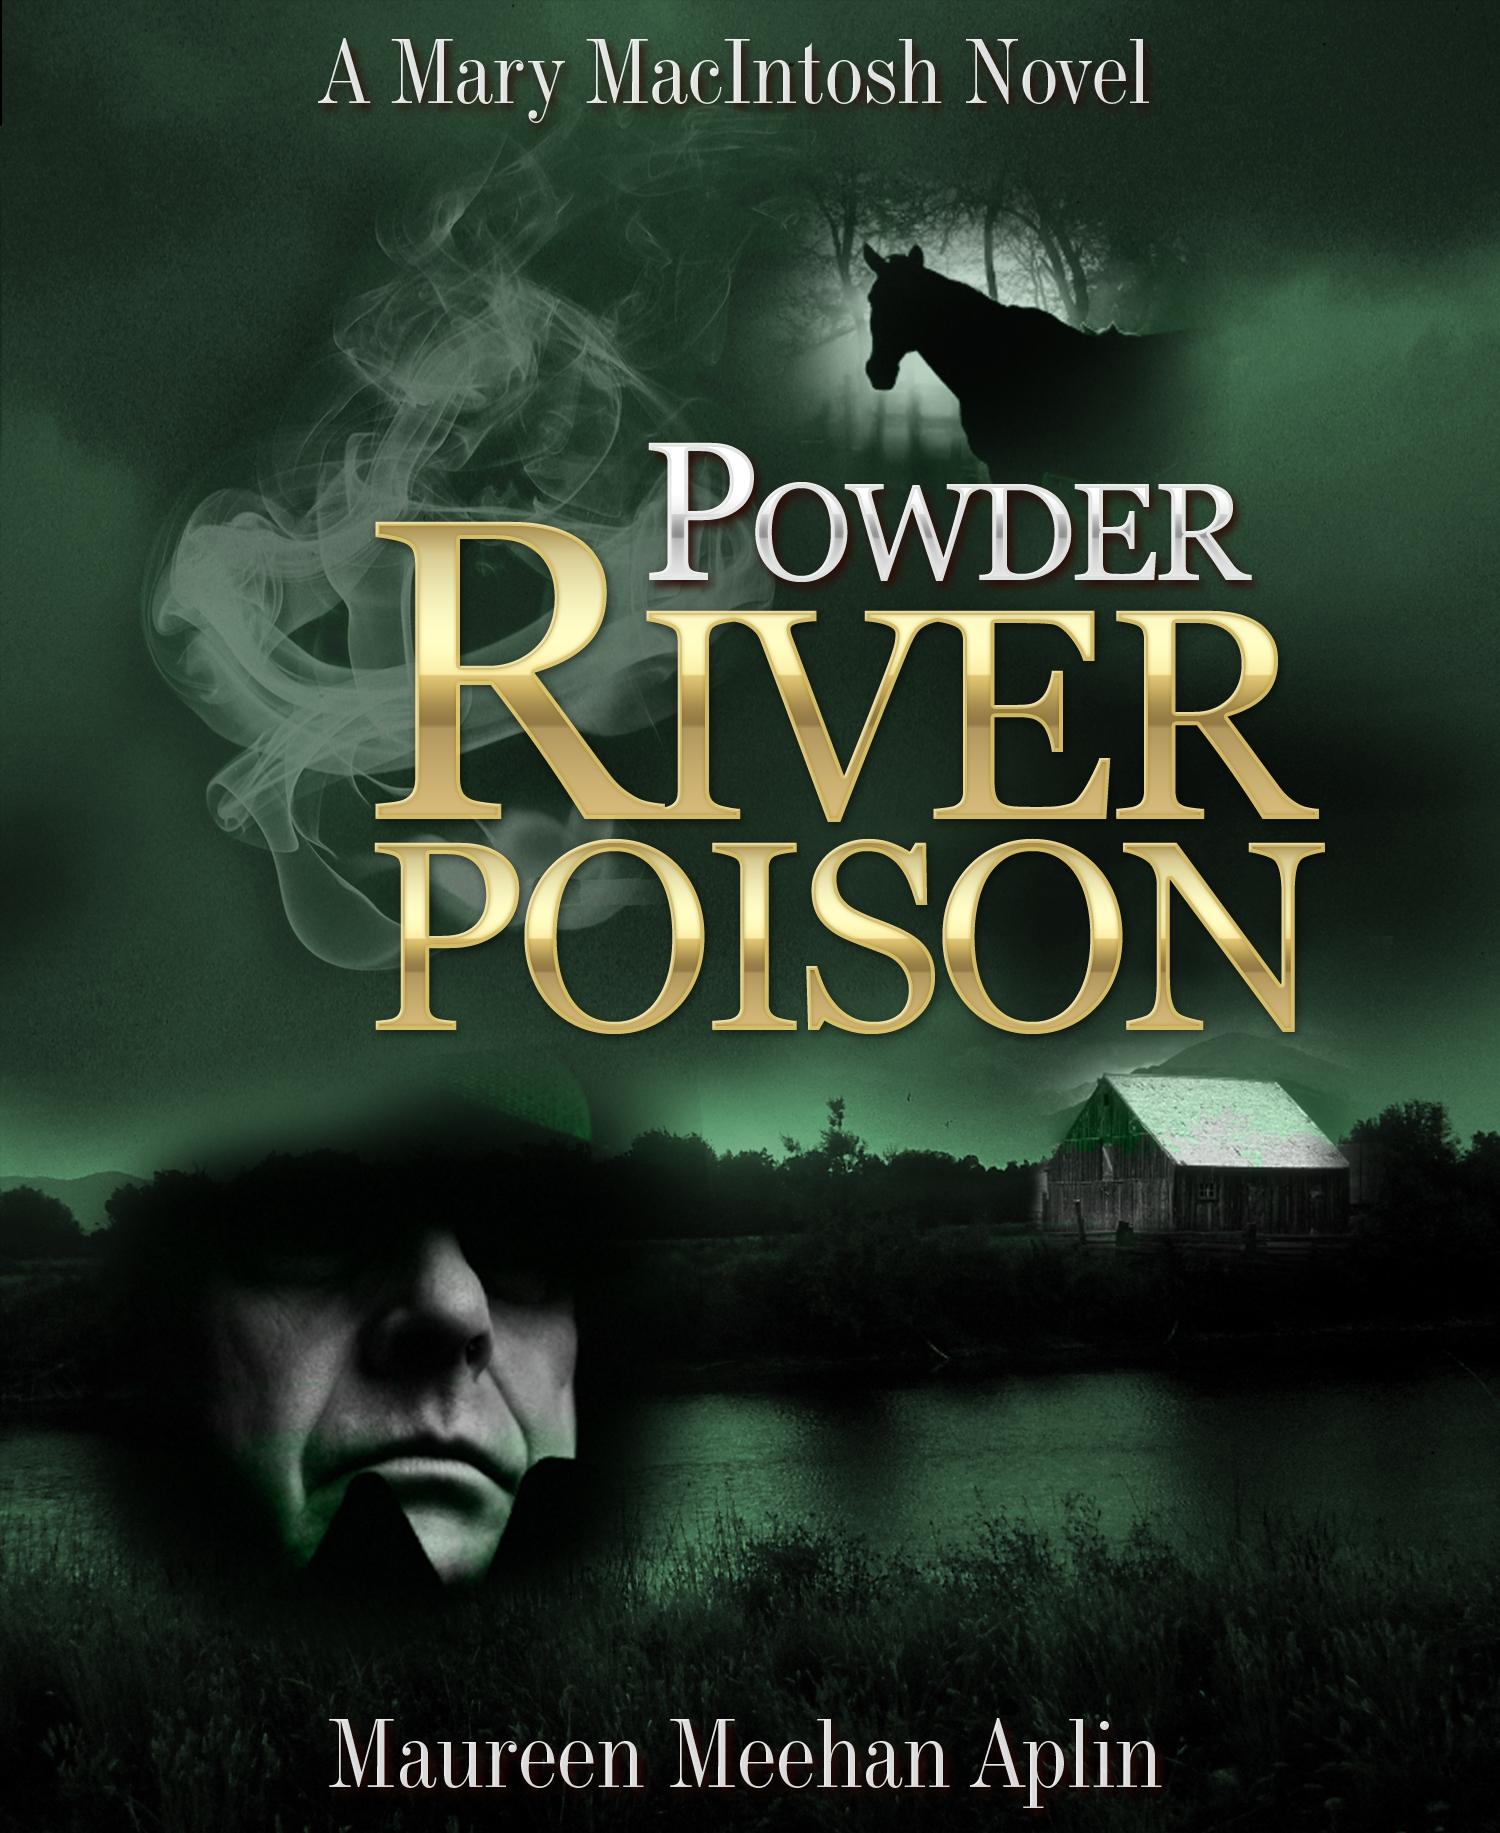 Powder River Poison, a Mary MacIntosh novel